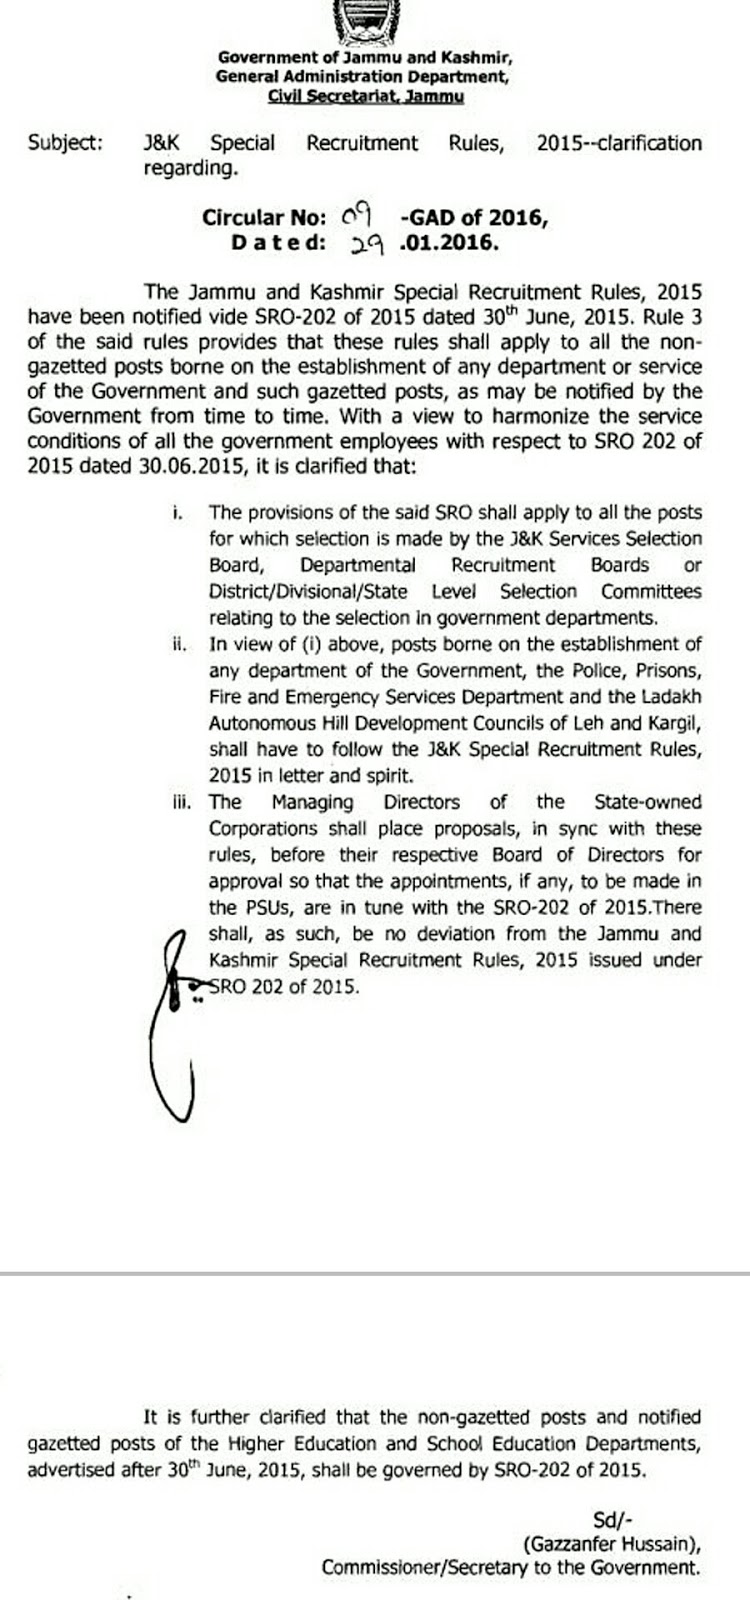 Medicos-Hub: JK SPECIAL RECRUITMENT POLICY SRO 202 of 2015